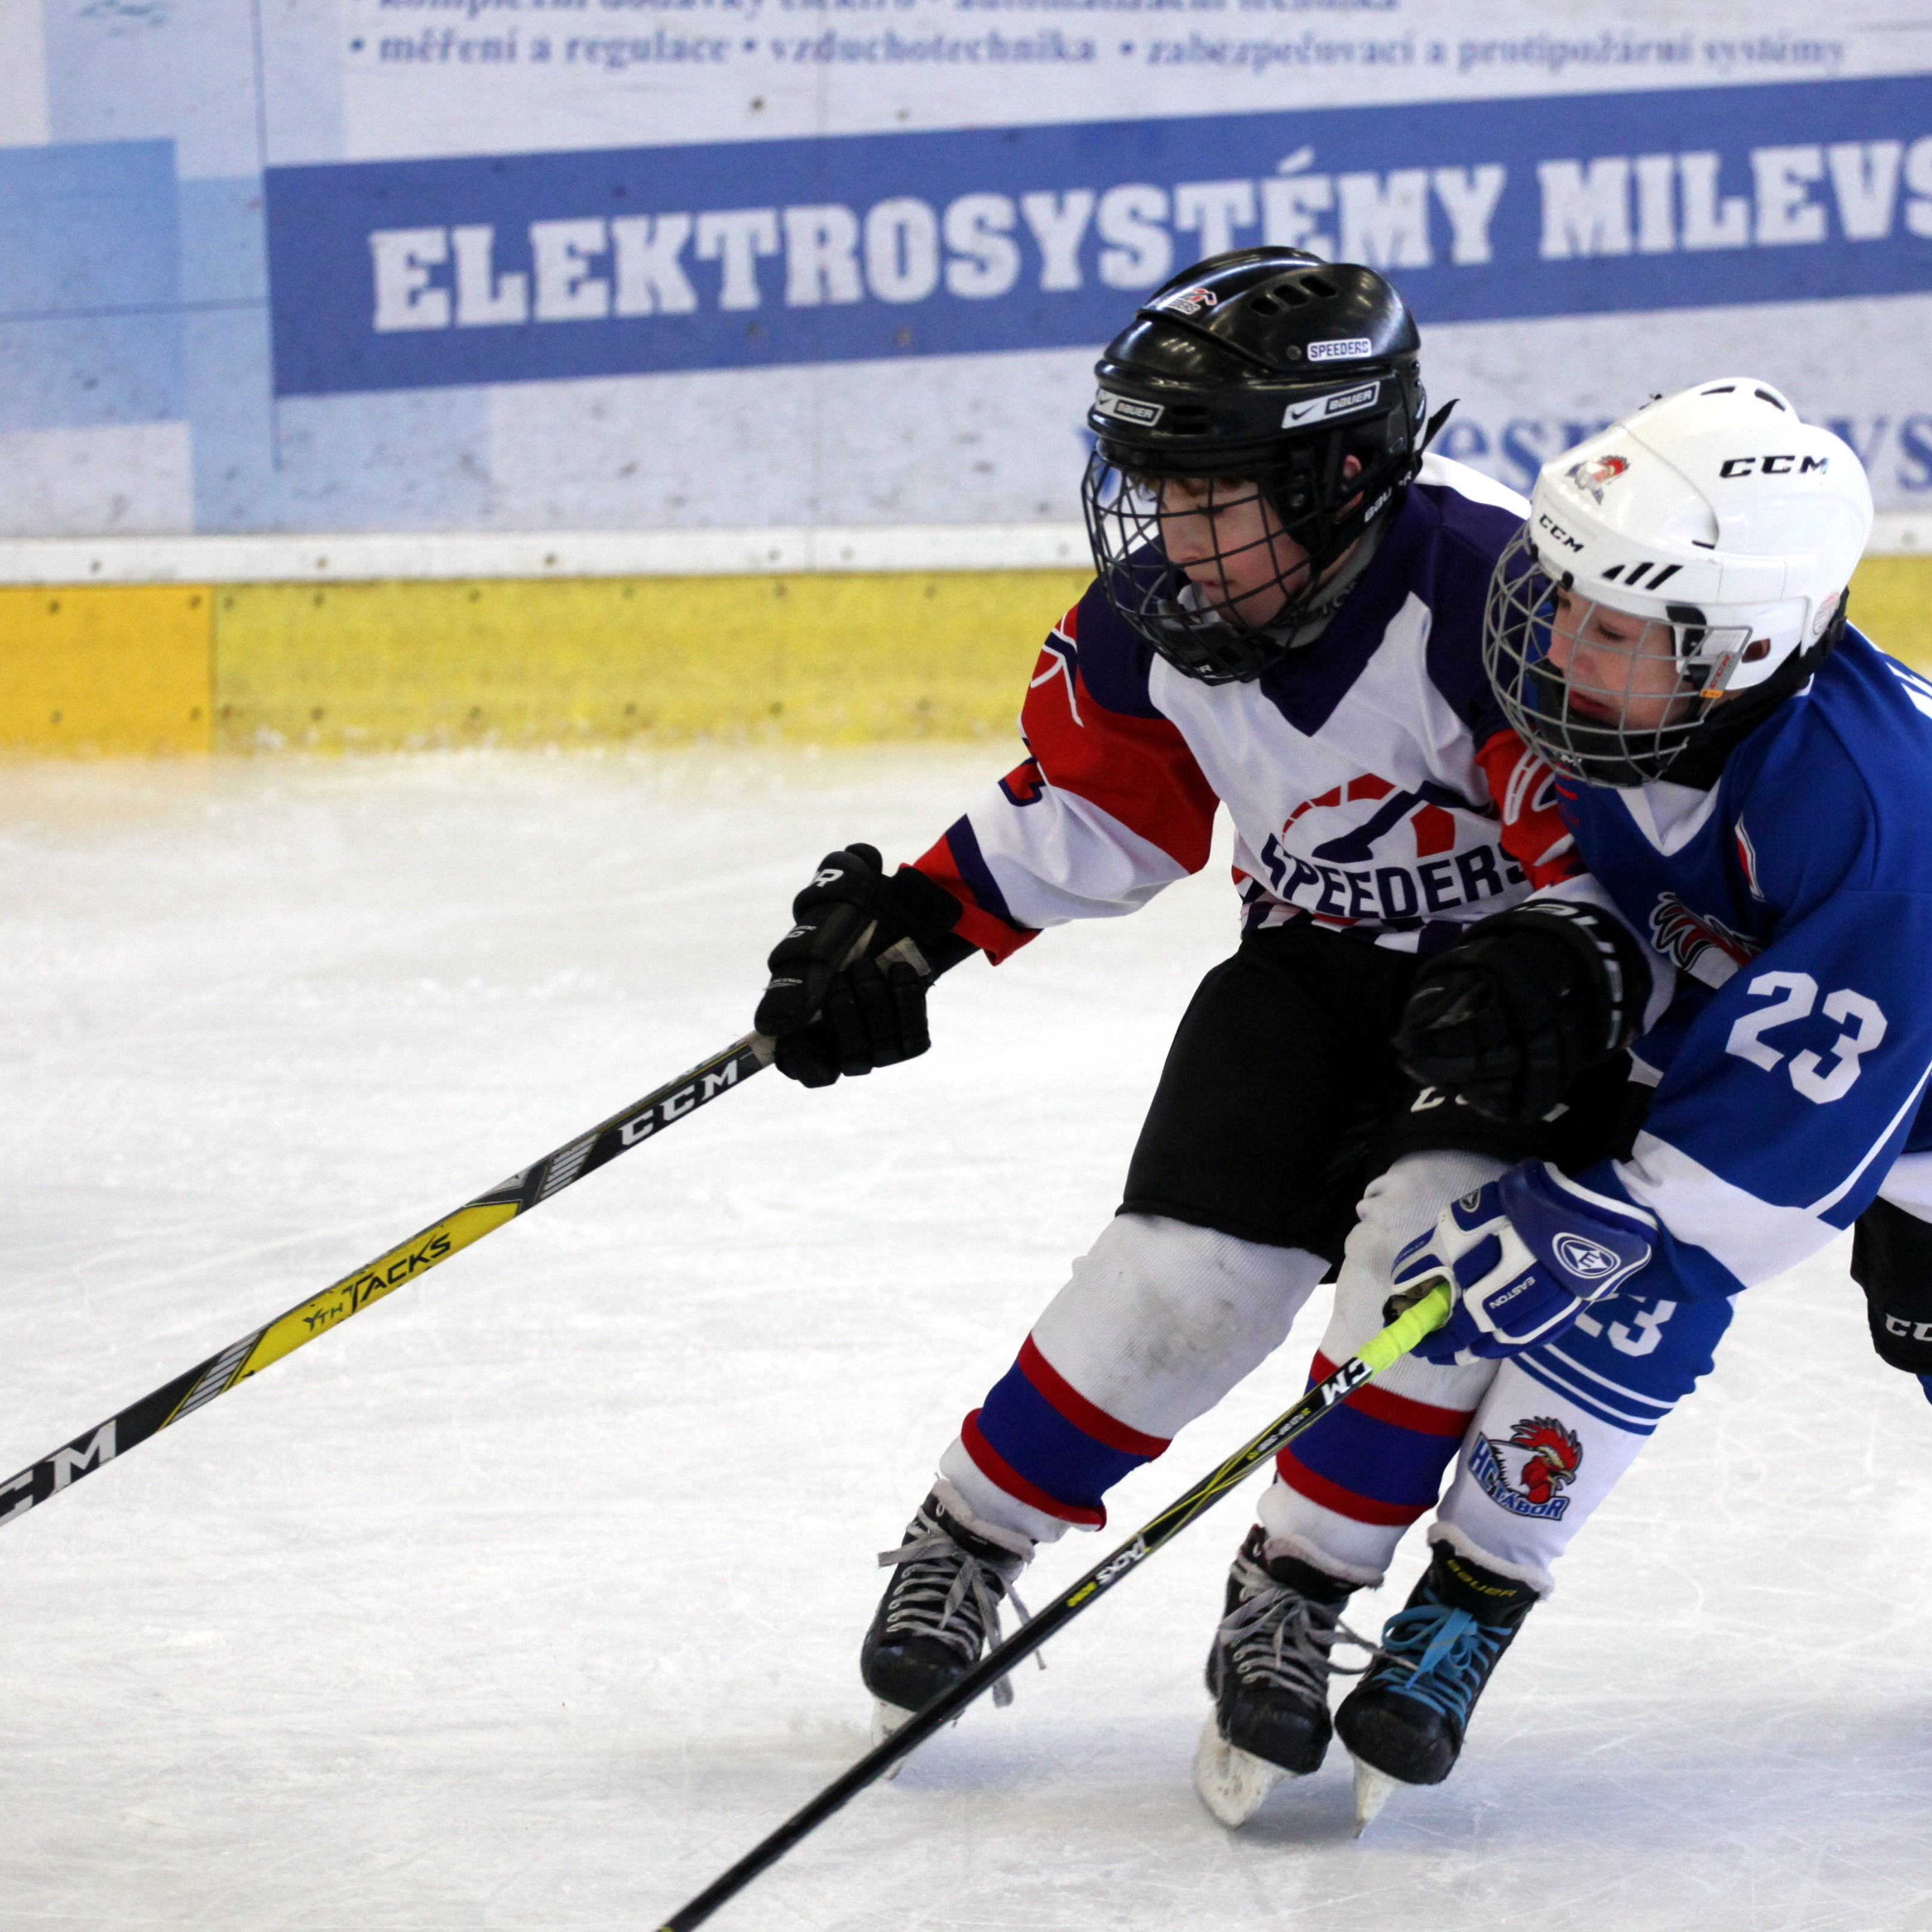 Hockey Speeders Bratislava turnaj Milevsko Janko 2